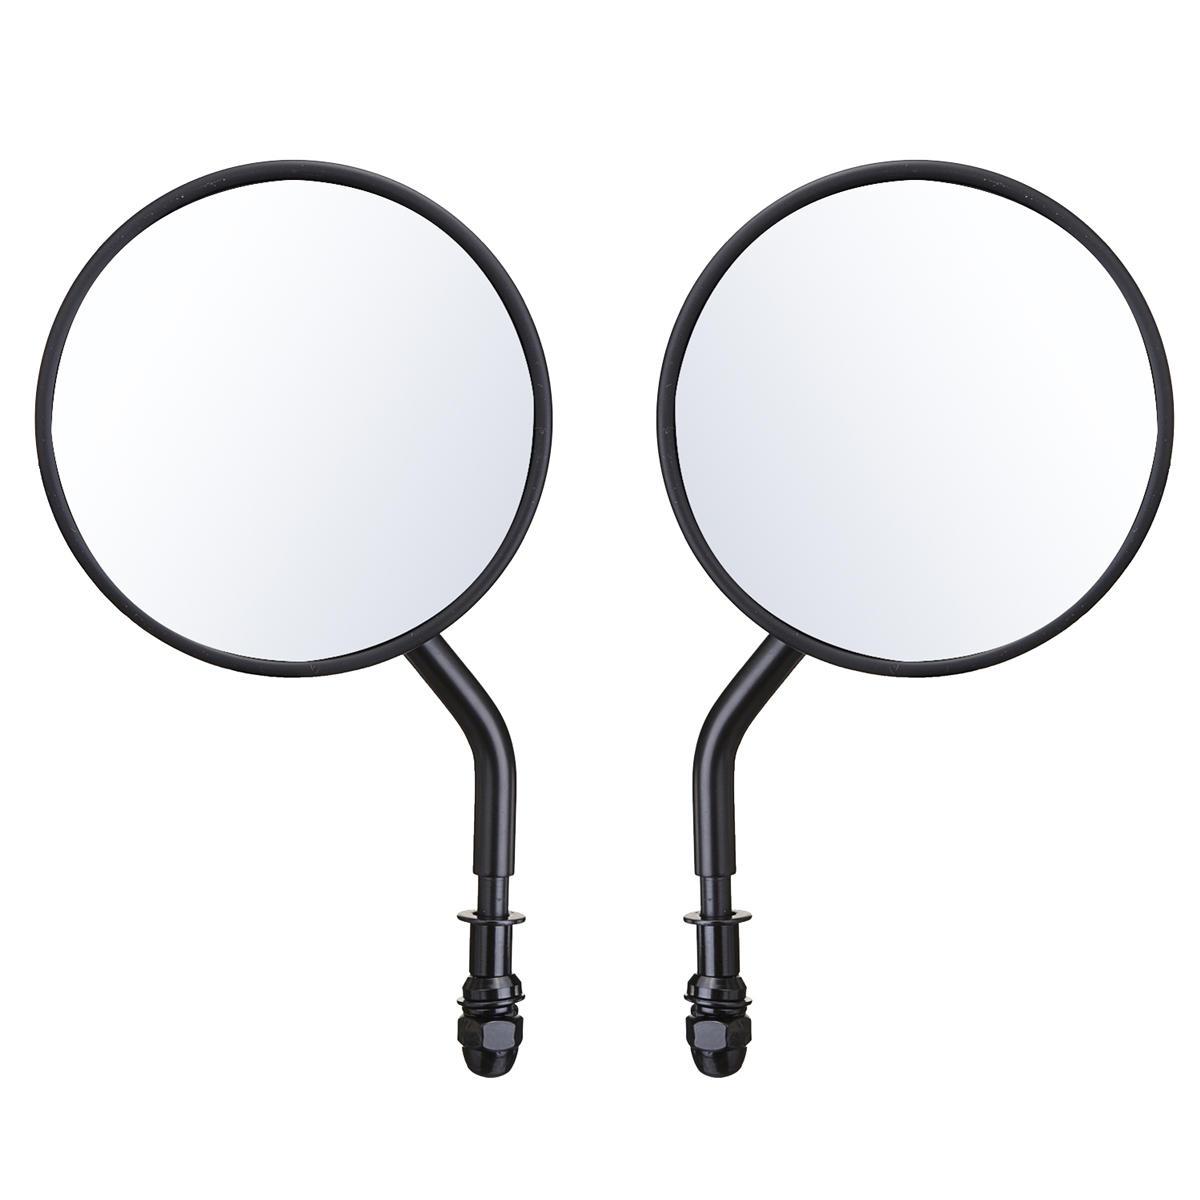 diameter 105mm retro round rearview motorcycle mirrors